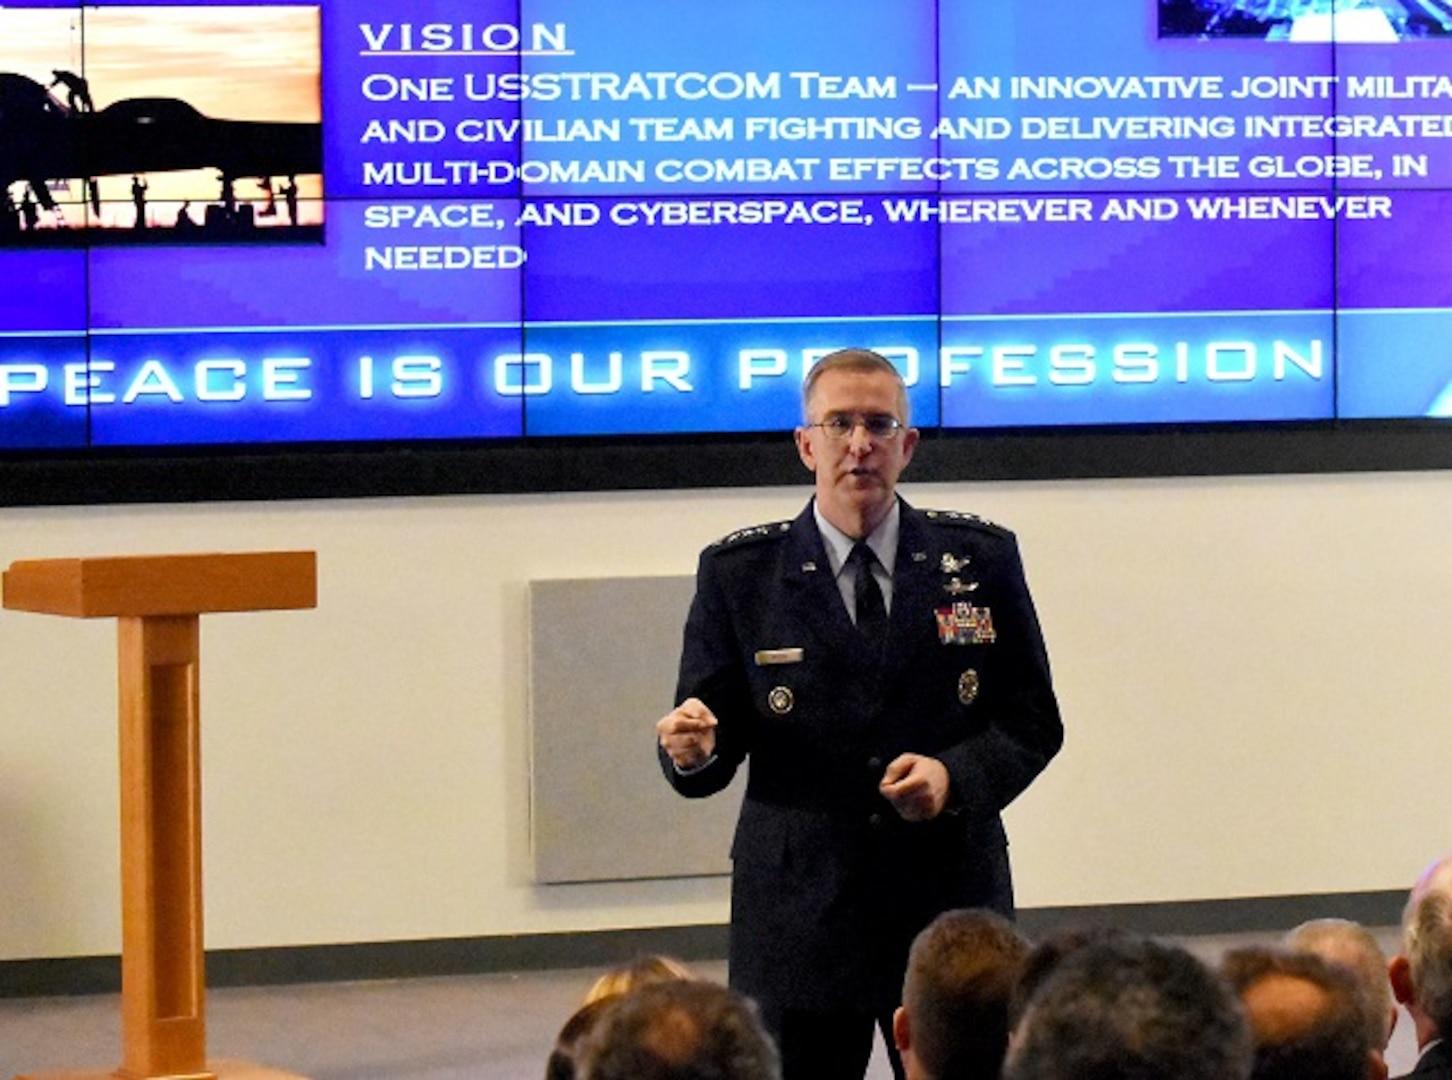 U.S. Strategic Command (USSTRATCOM) commander, U.S. Air Force Gen. John E. Hyten, addresses members of U.S. Transportation Command (USTRANSCOM), at Scott Air Force Base, Ill., March 6, 2017. Hyten was invited by USTRANSCOM commander, U.S. Air Force Gen. Darren W. McDew, as part of USTRANSCOM's 30-4-30 Distinguished Speaker Series.